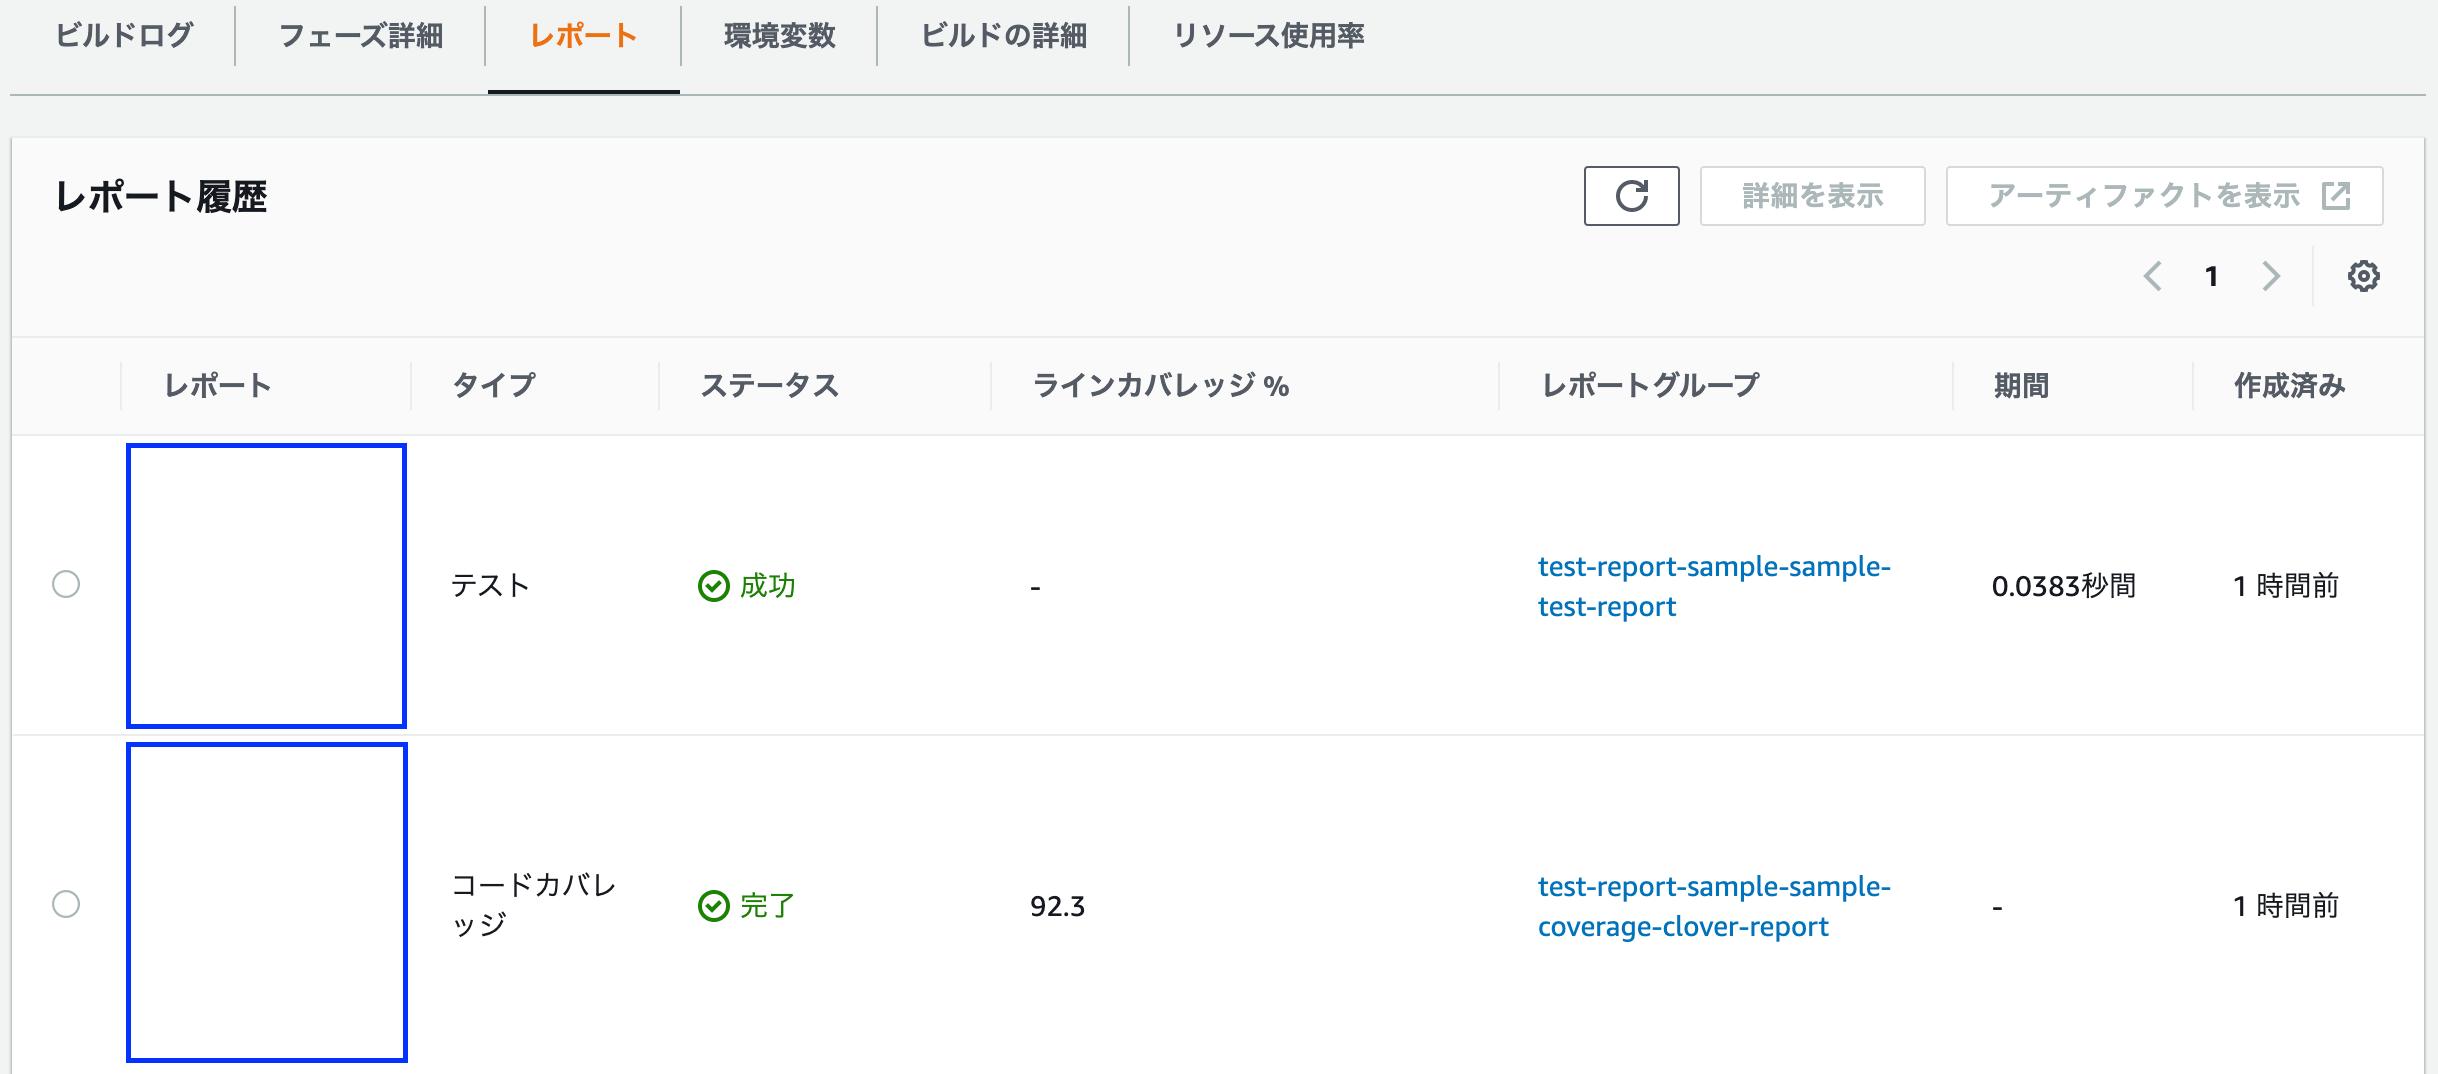 test-reports-sampleビルドプロジェクトにおけるレポートタブを開いた画面